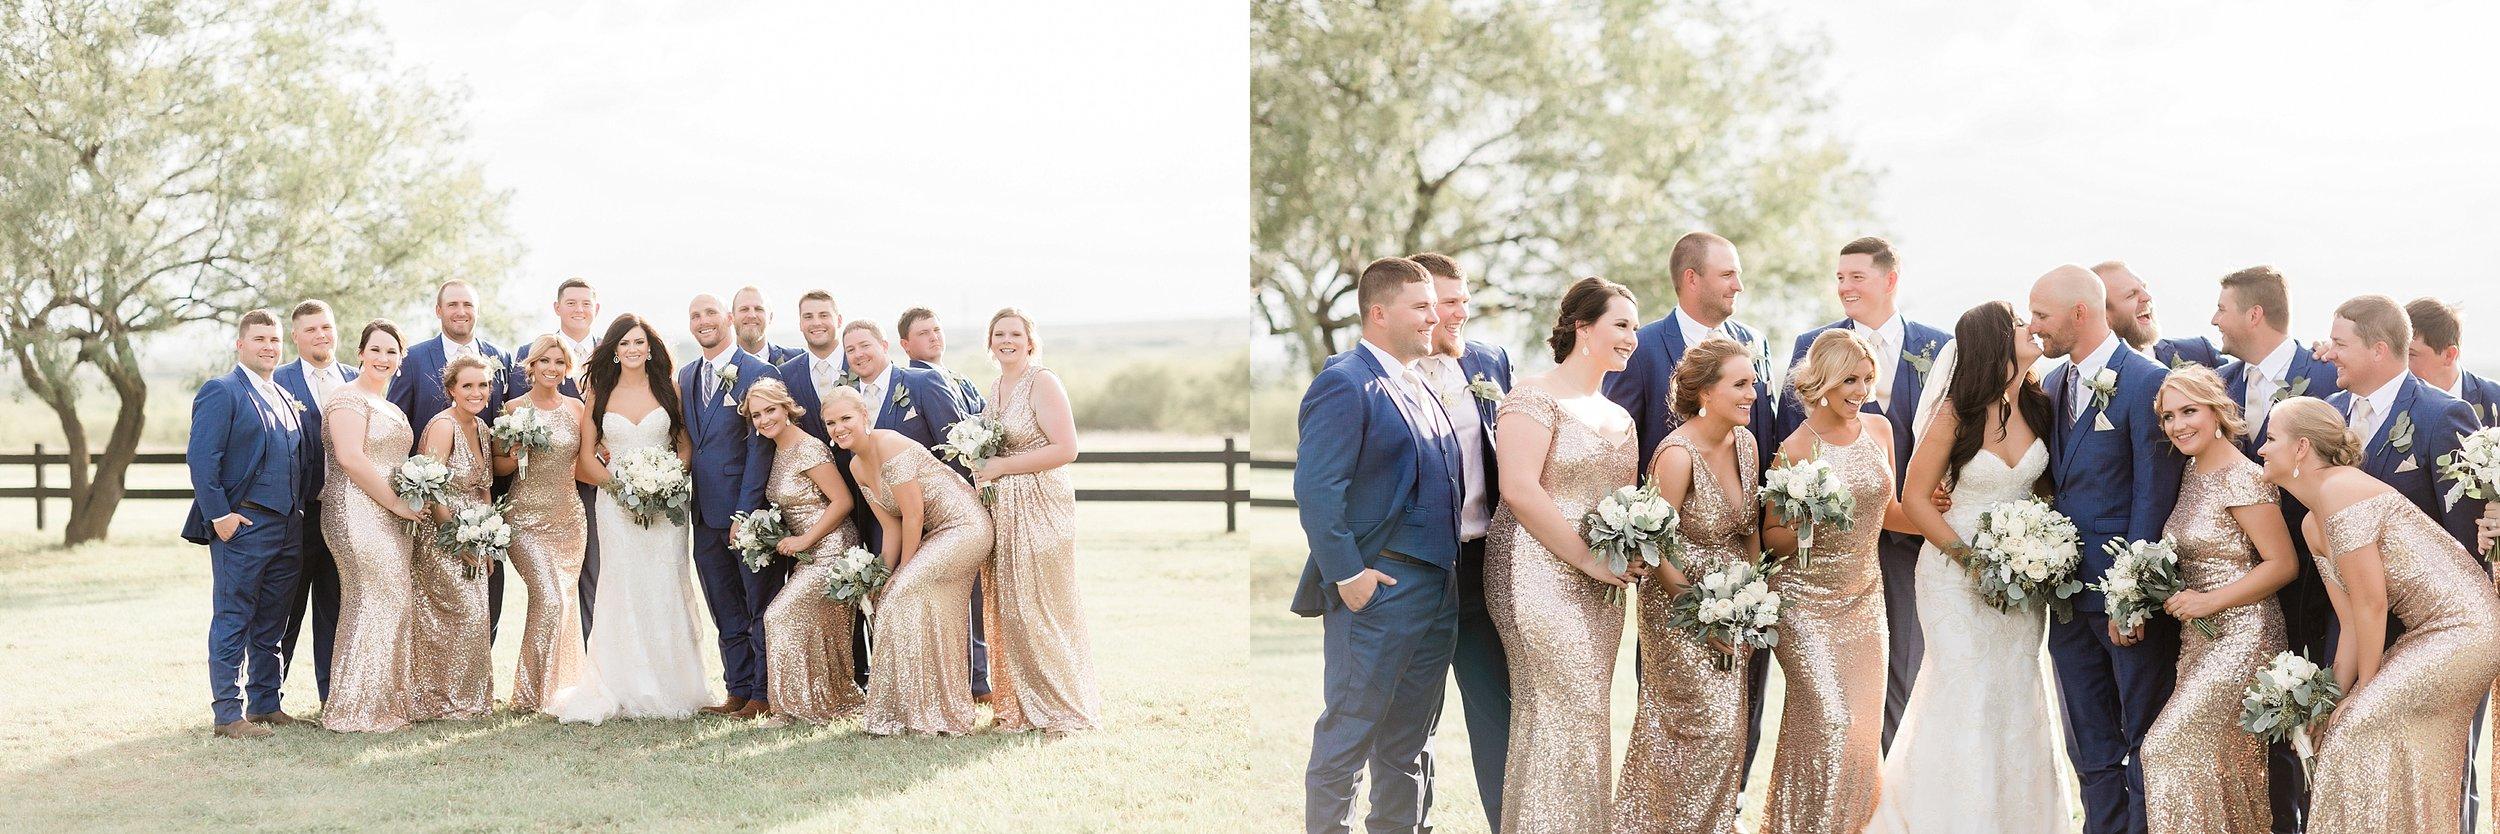 bailey-and-carl-coyote-ranch-resort-wedding-photographer-wichita-falls-texas-destination-wedding-0035.jpg